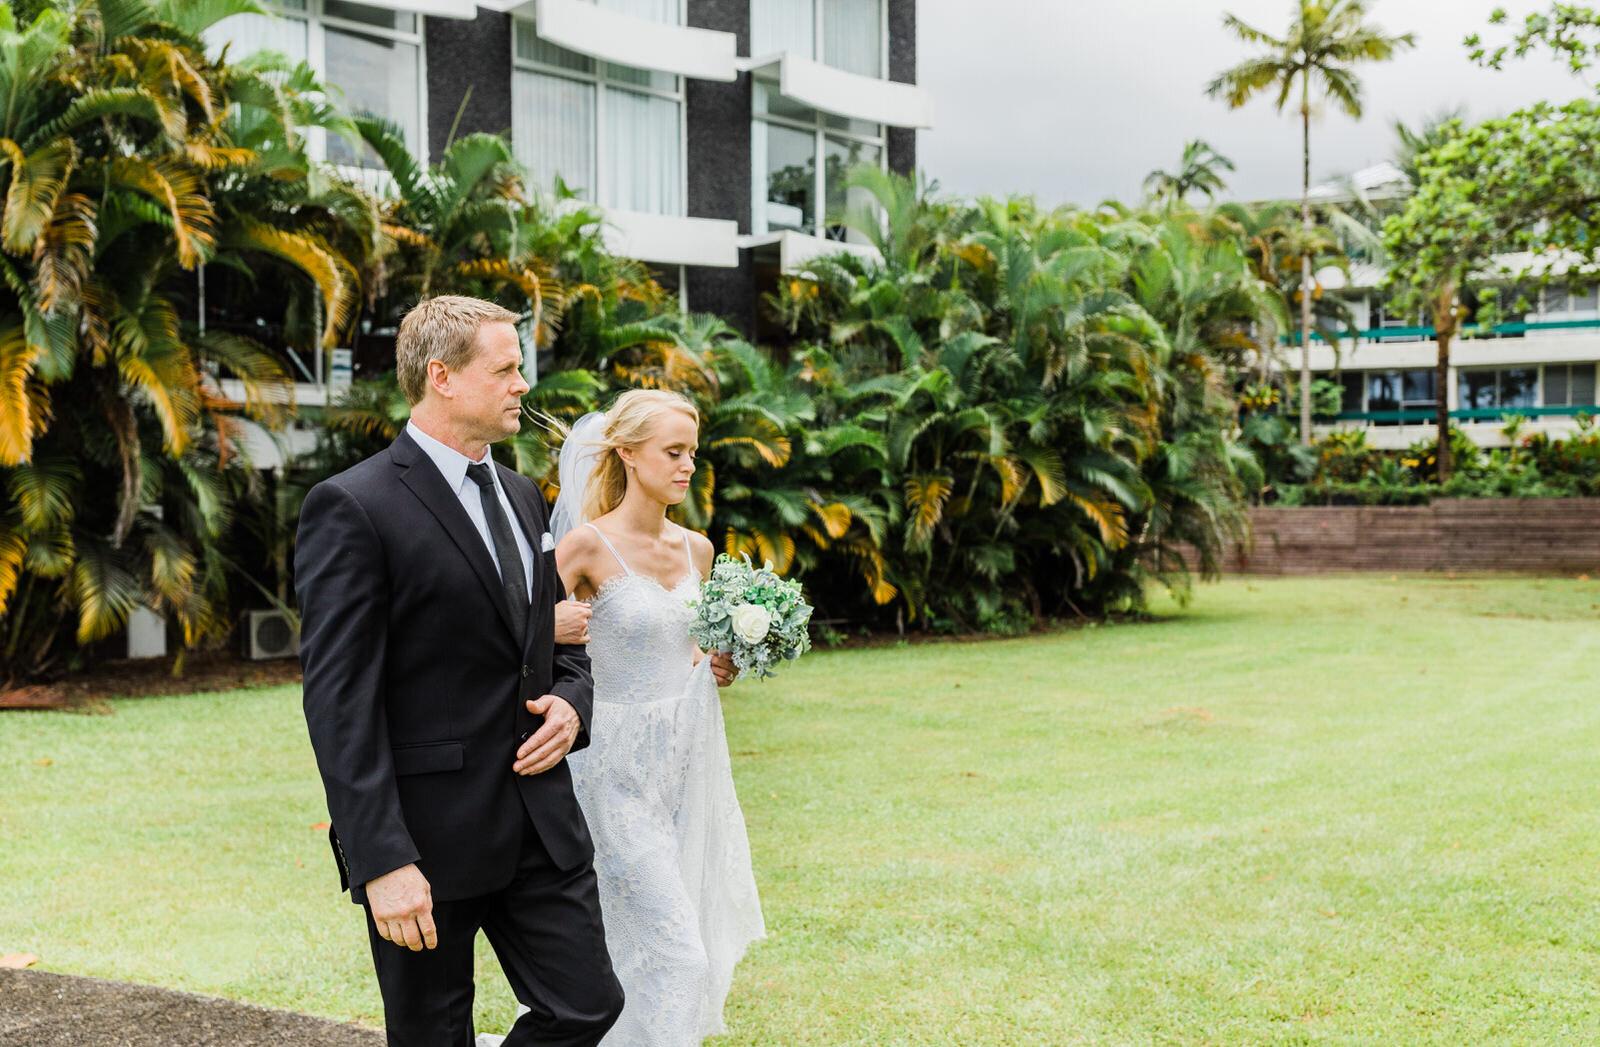 small-wedding-hawaii-destination-hilton-coconut-island-9662.jpg